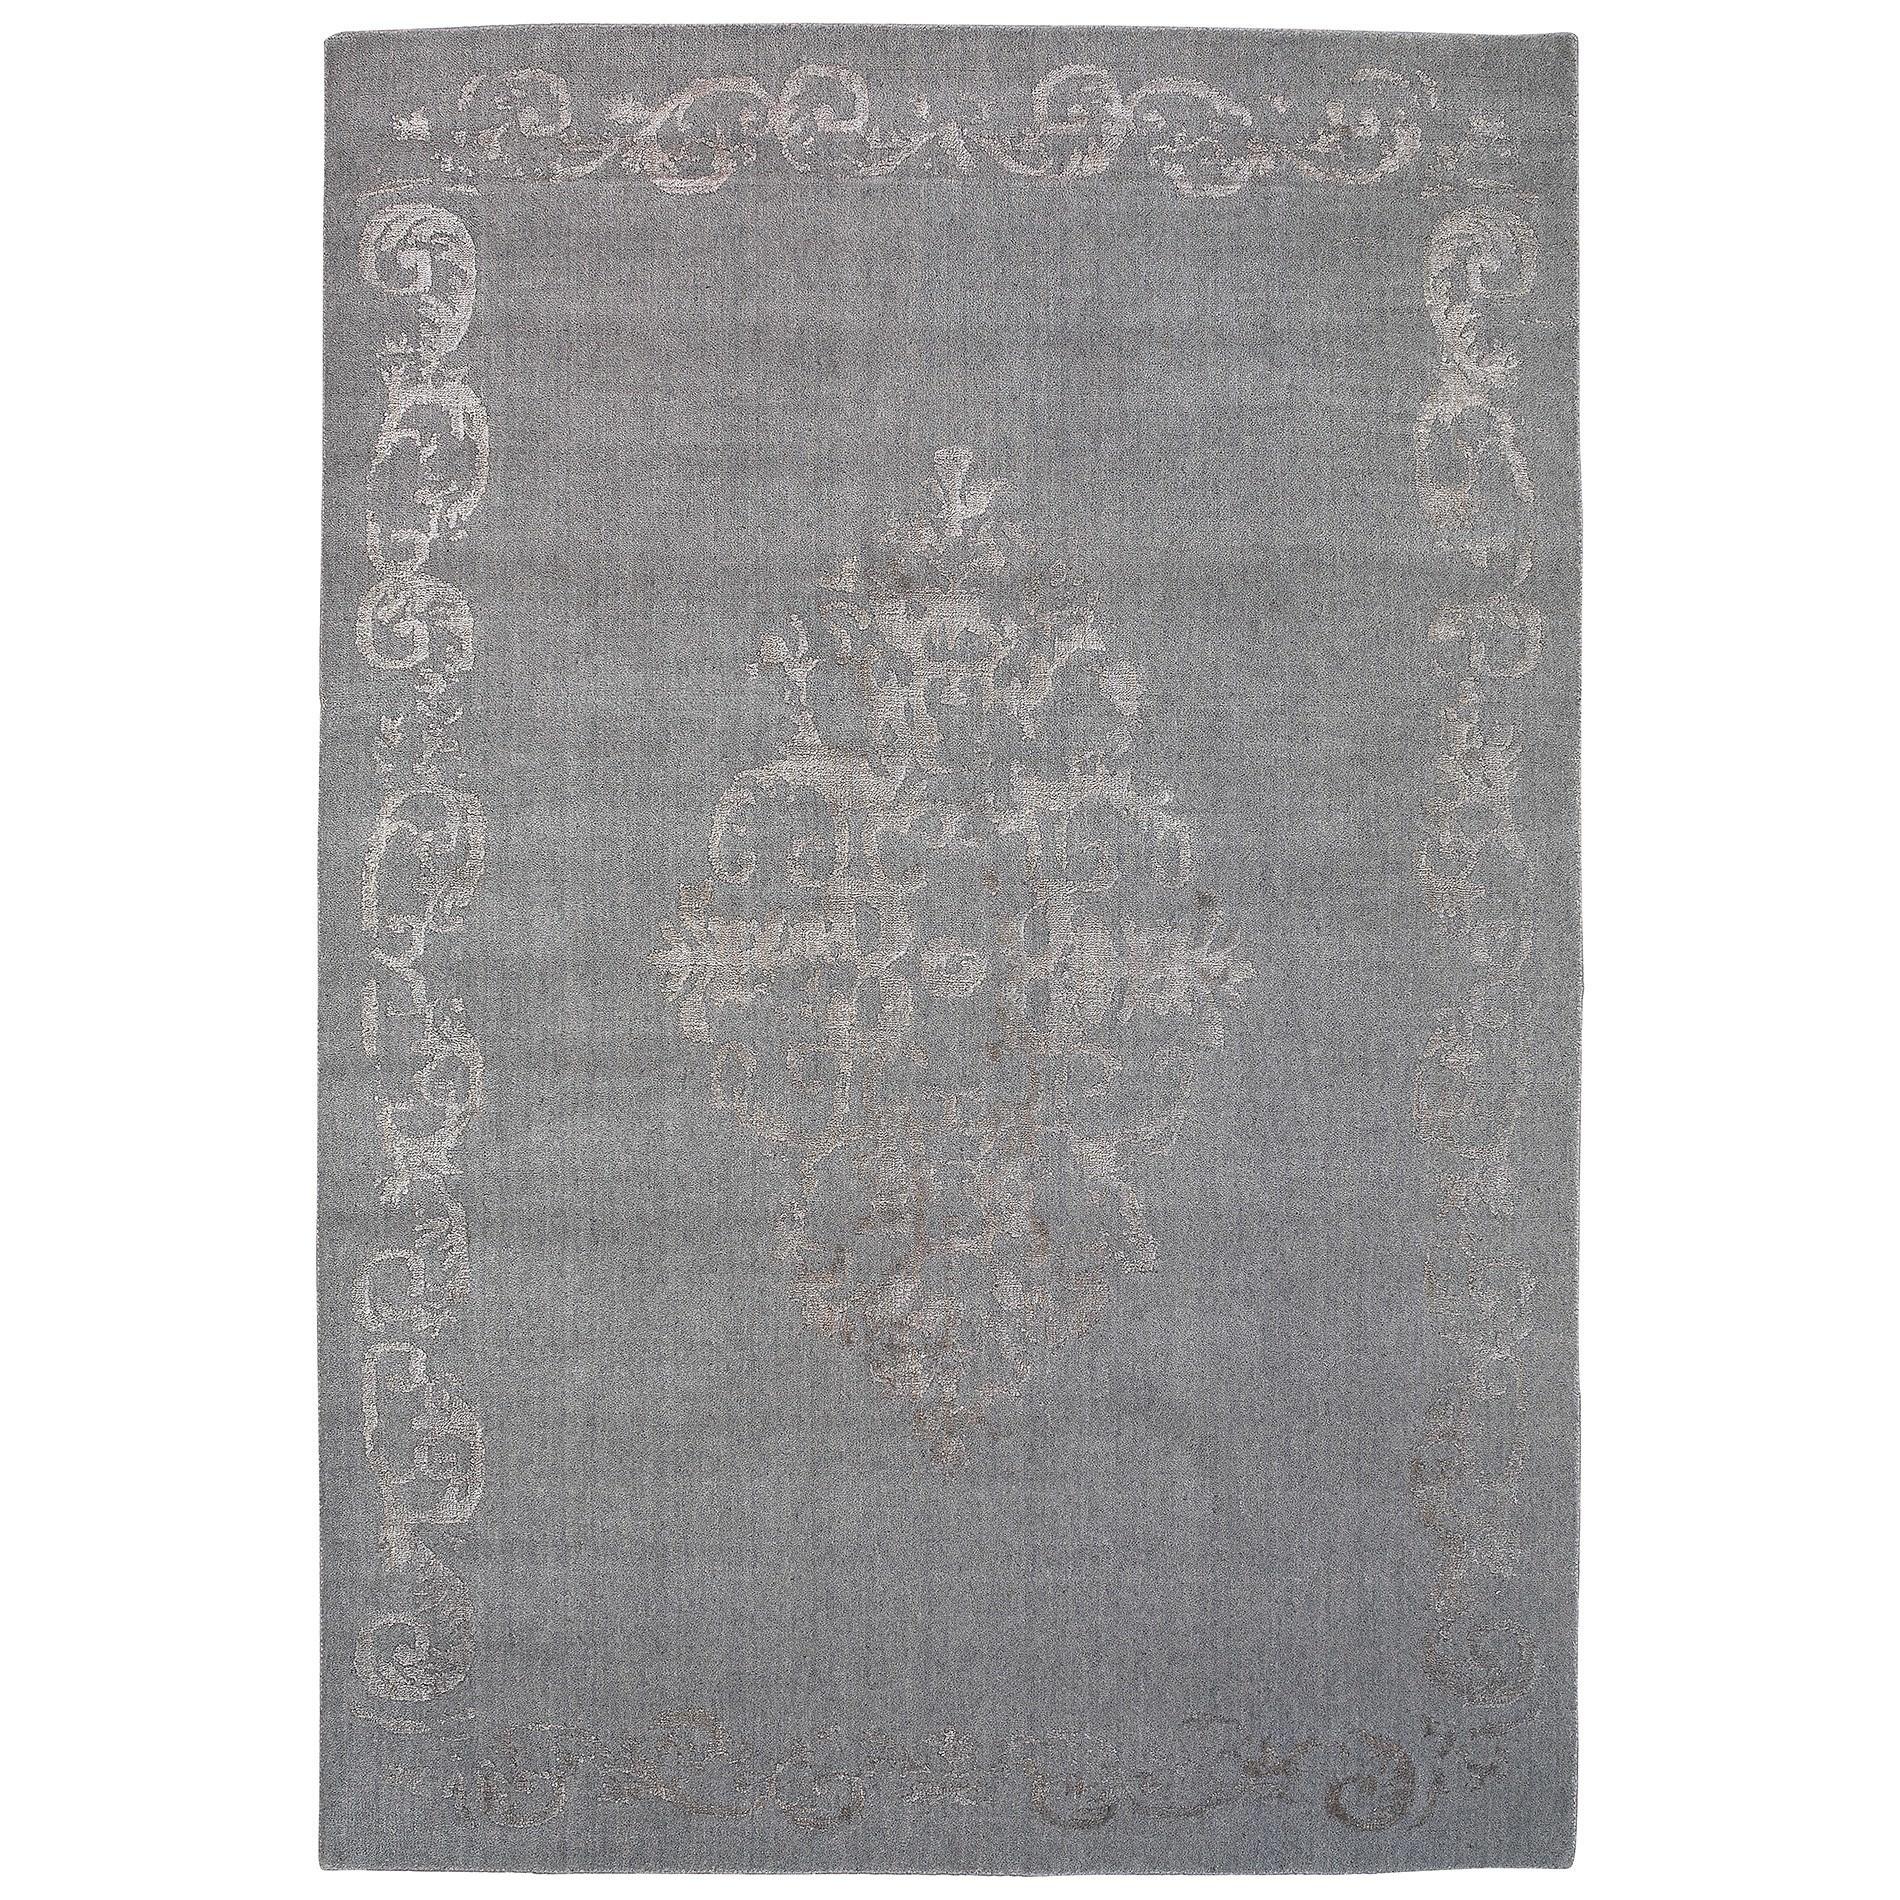 Vienna No.048 Handmade Wool Transitional Rug, 330x240cm, Grey